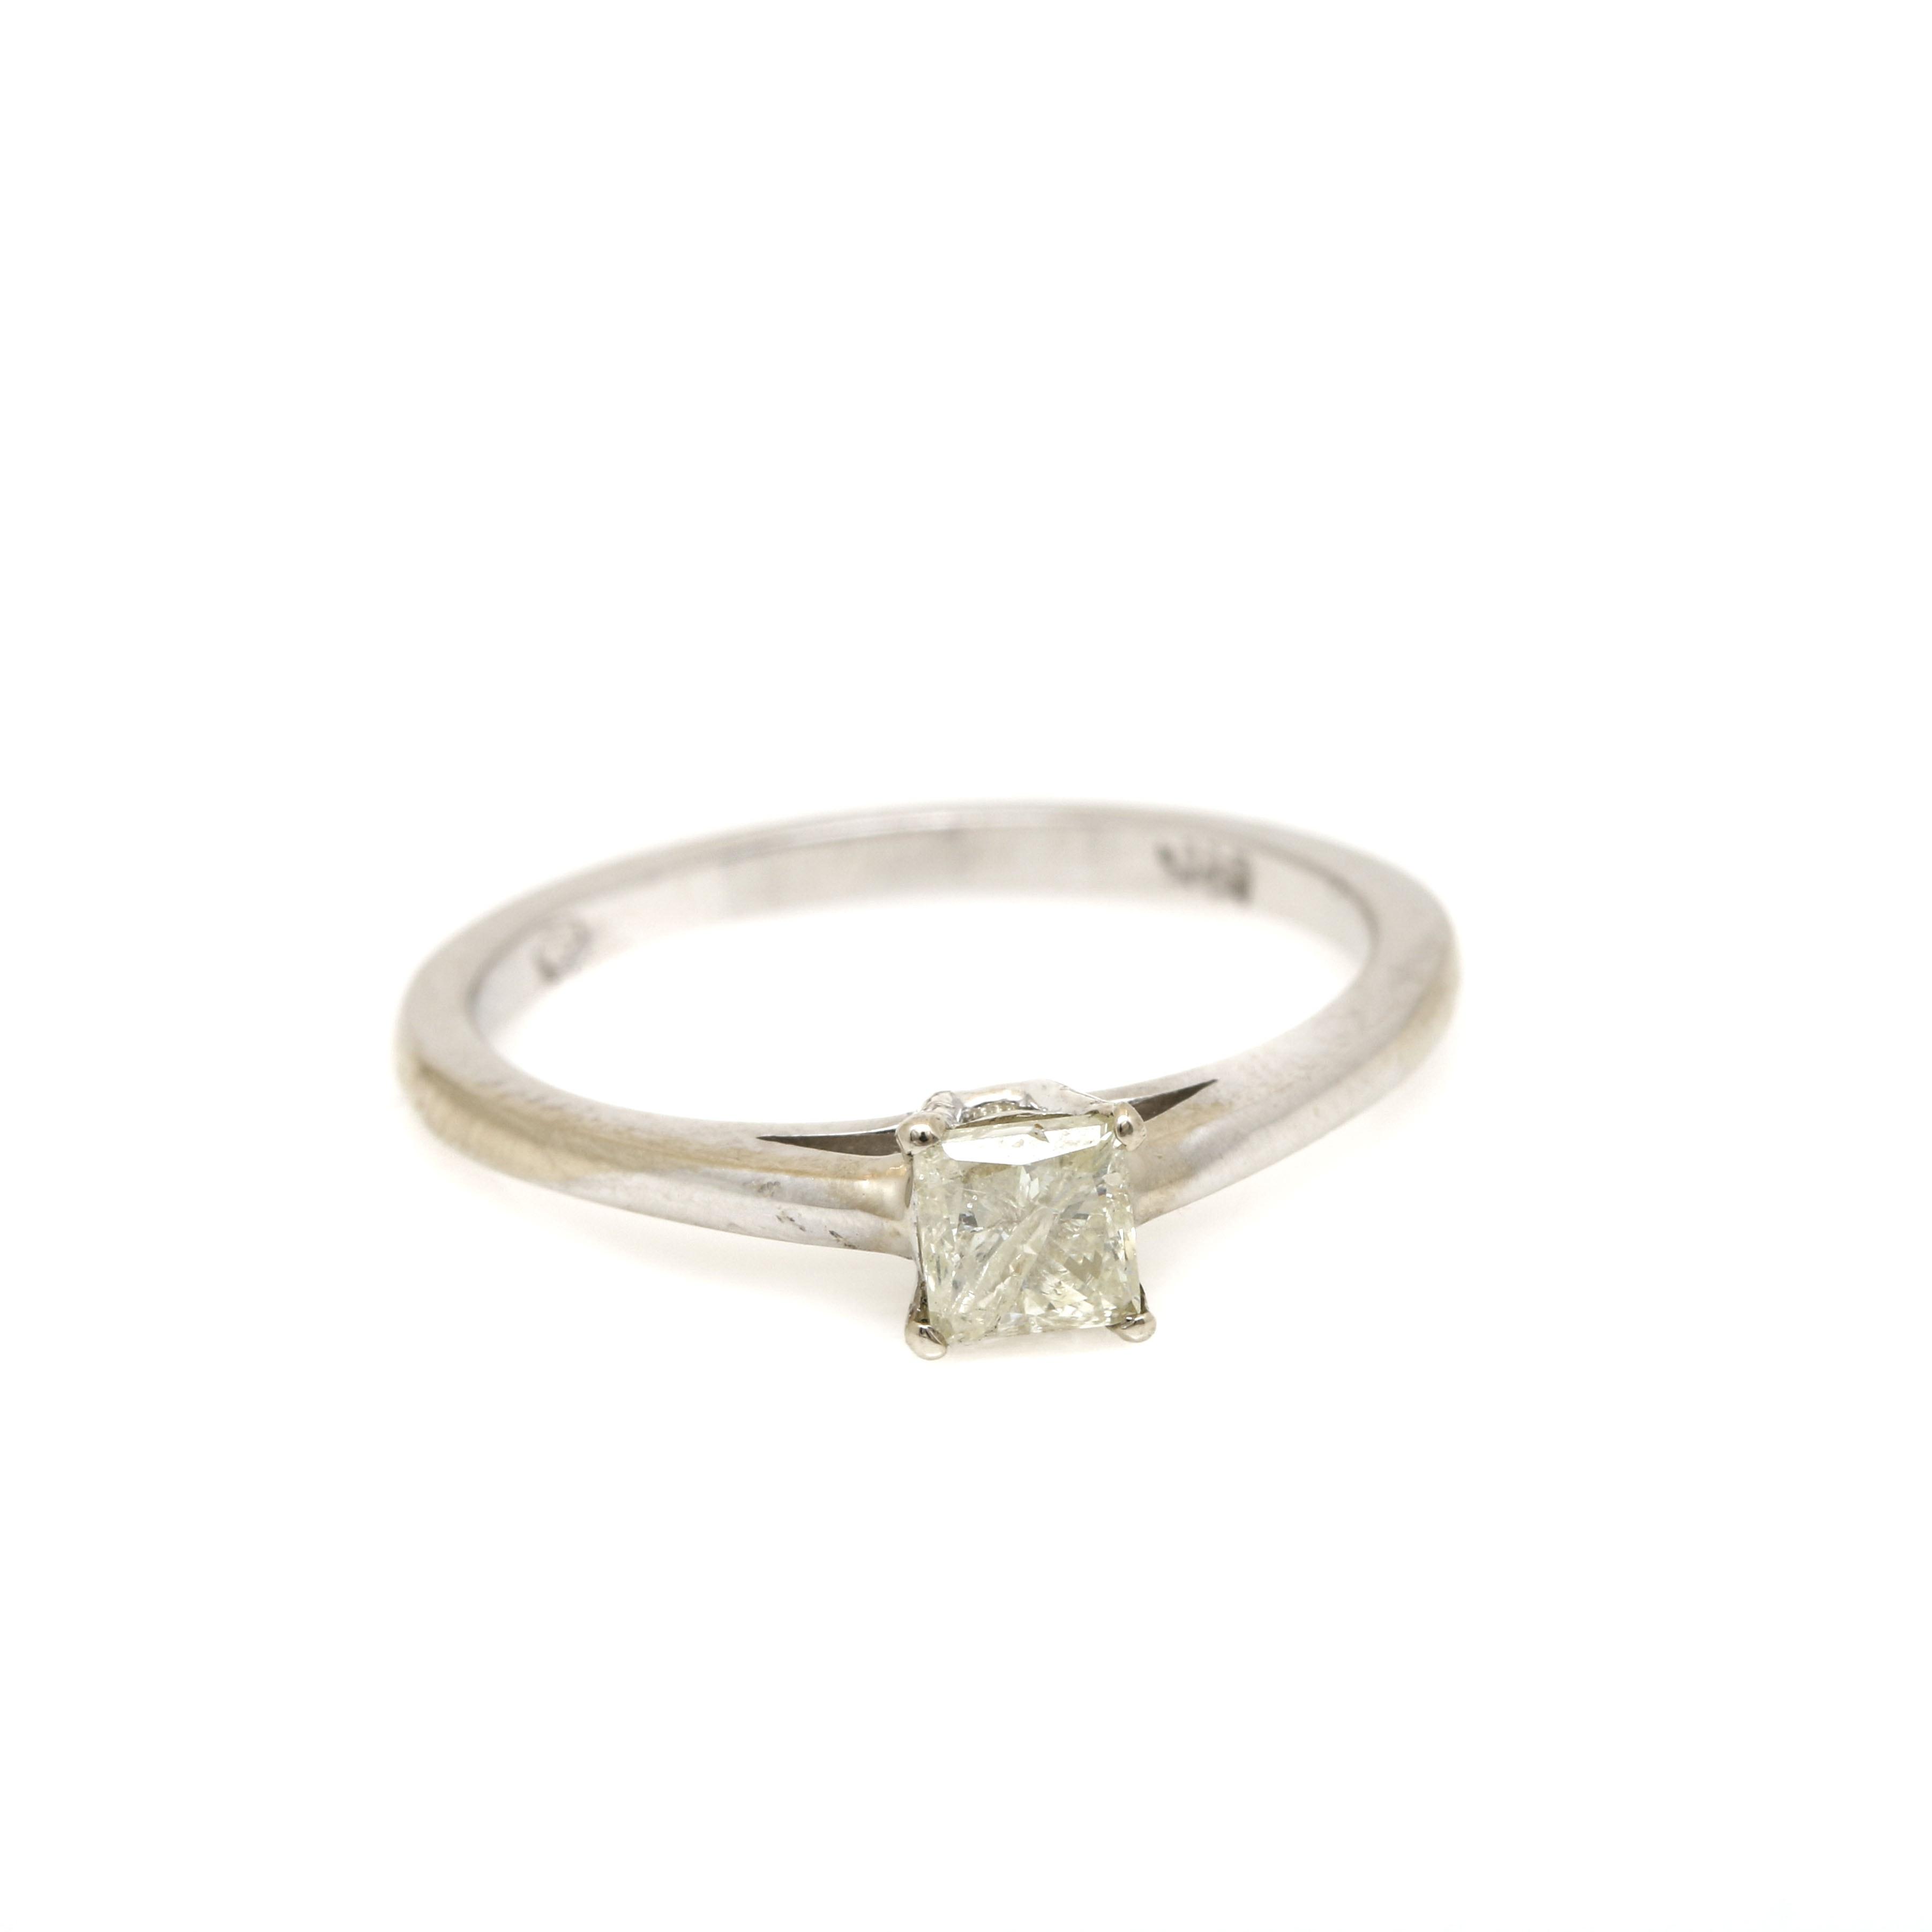 14K White Gold Diamond Solitaire Ring